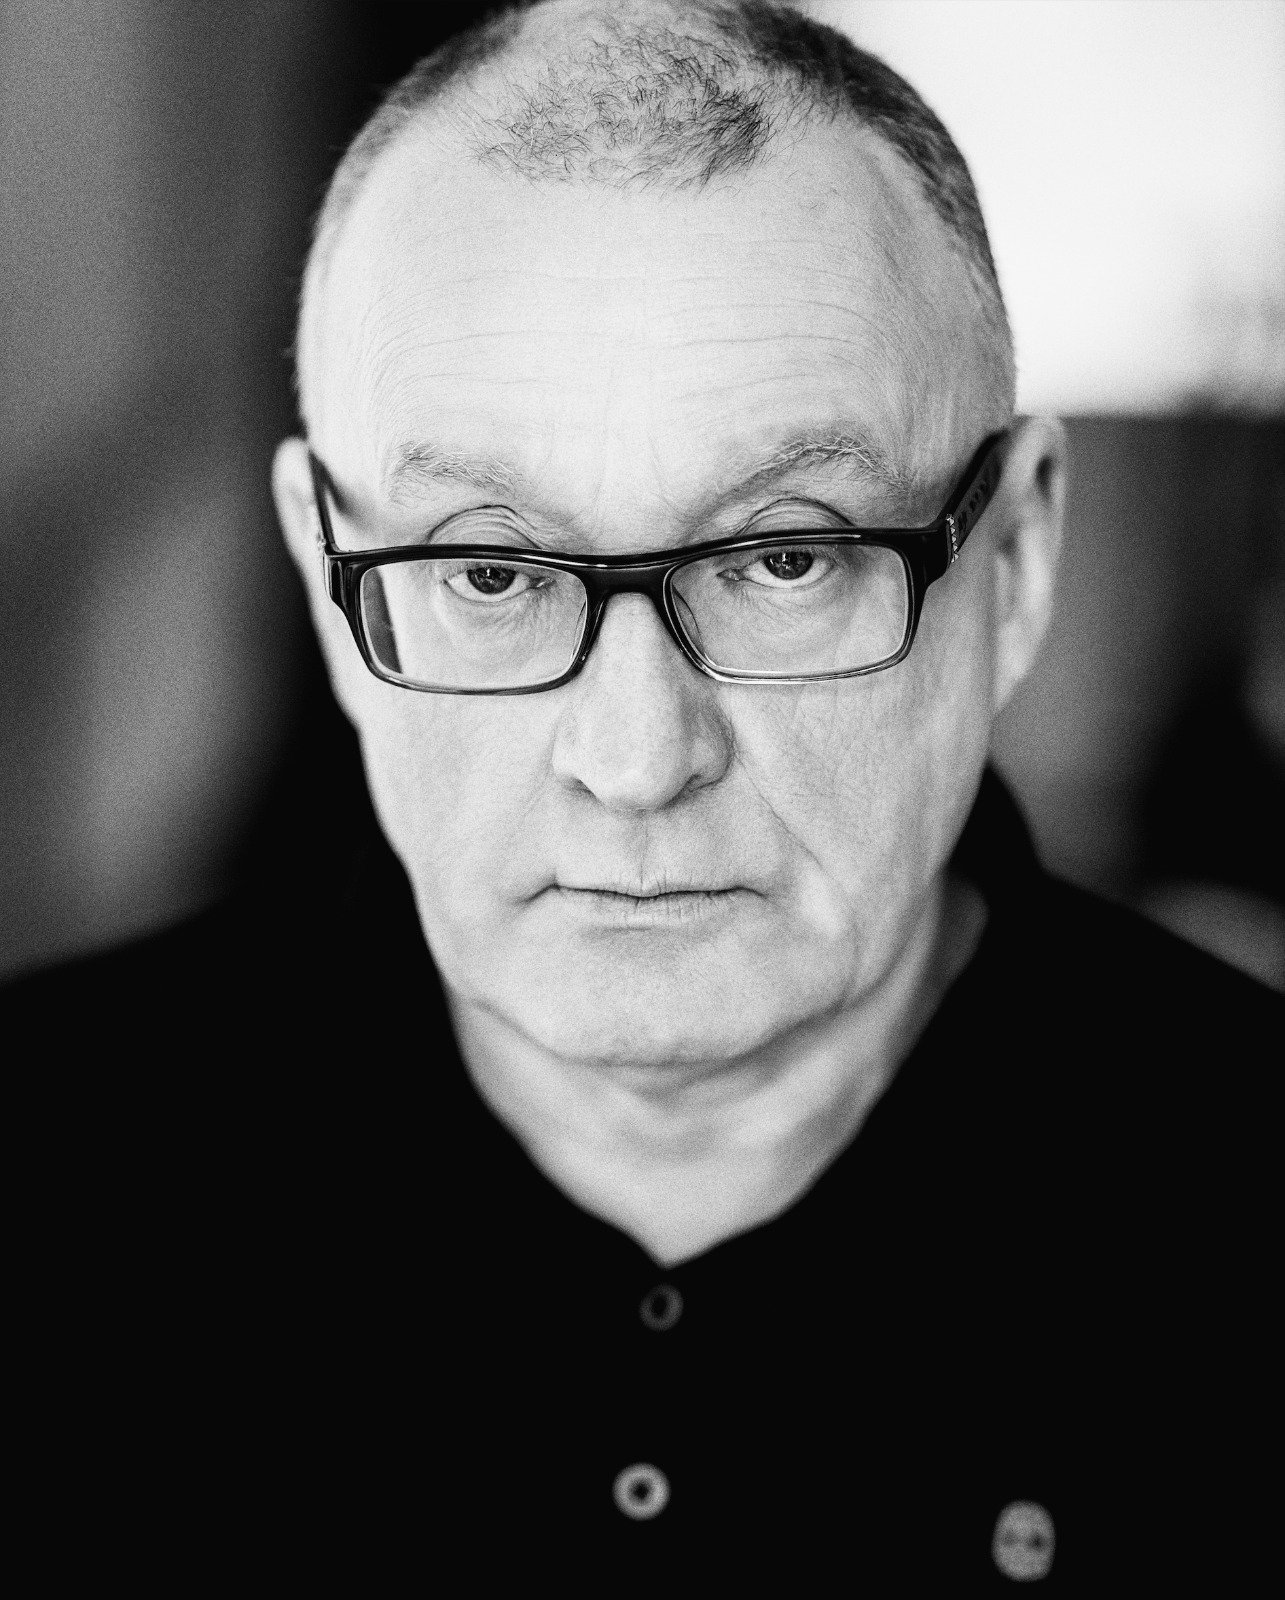 Stuart Cosgrove | photograph - by Kris Kesiak